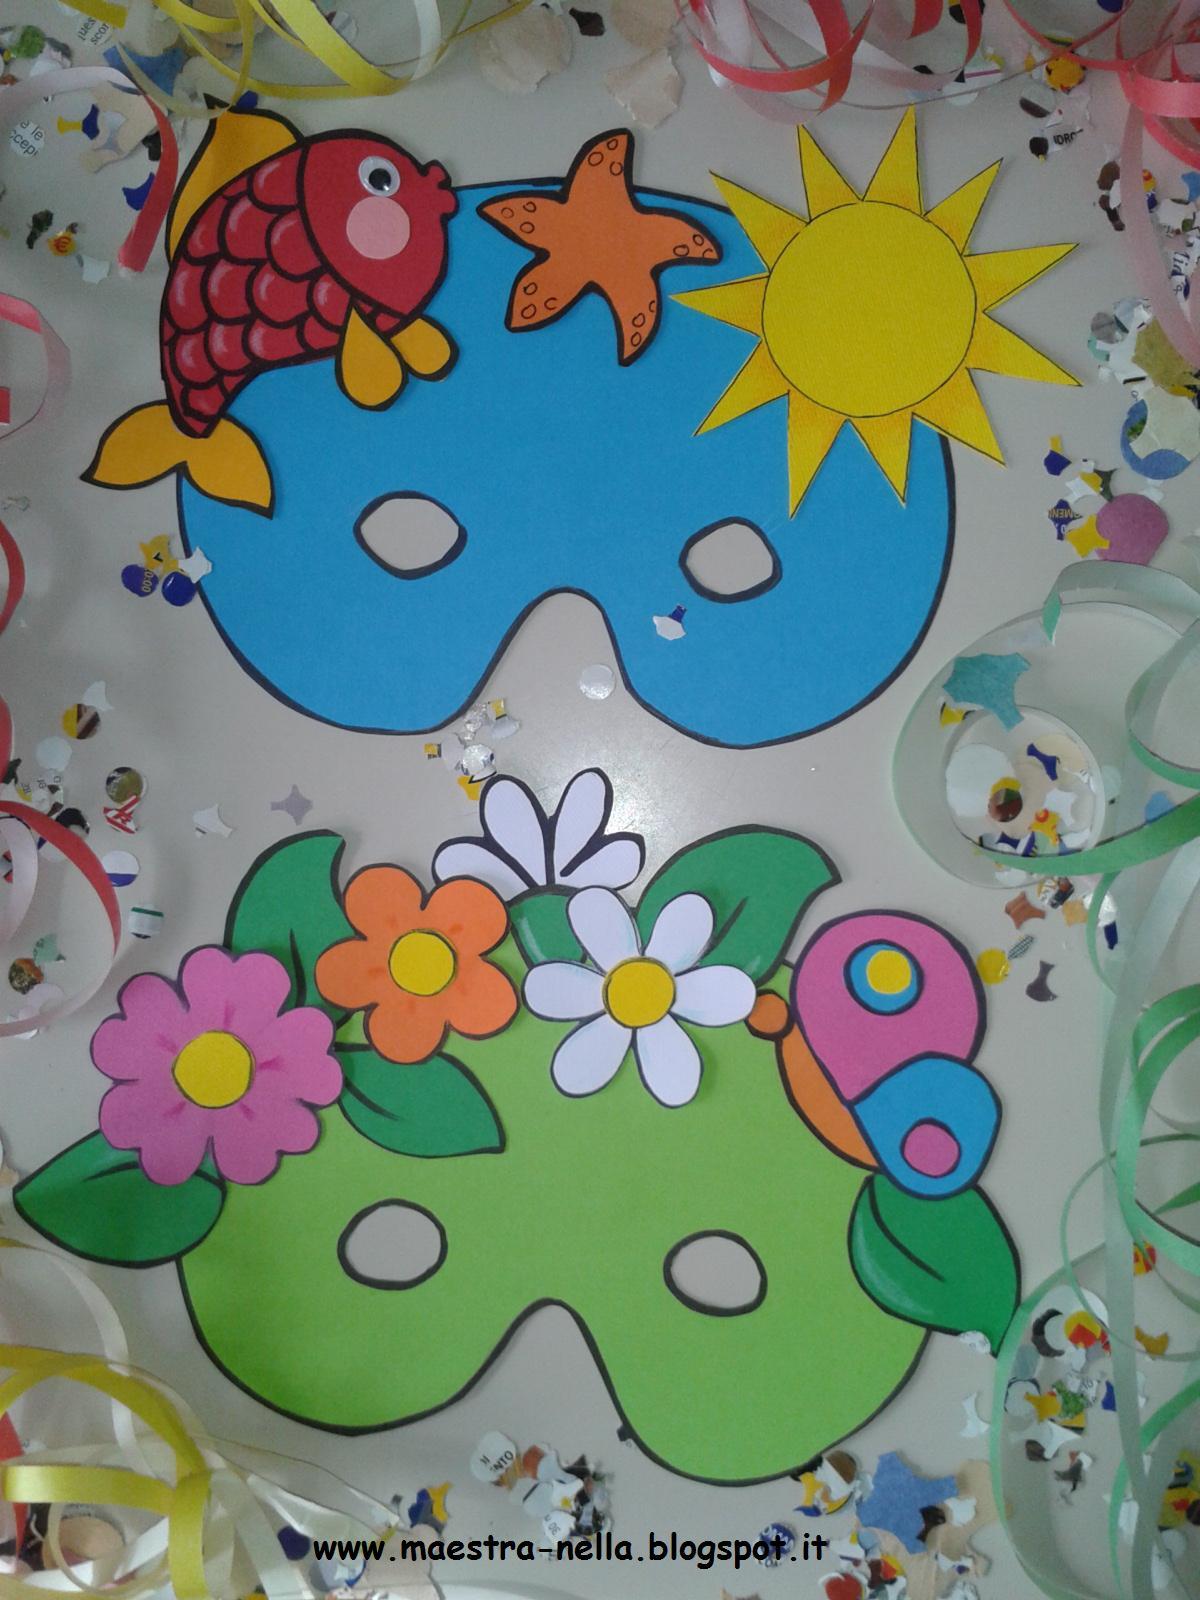 Maestra nella carnevale maschere 4 stagioni for Addobbi per l aula di carnevale